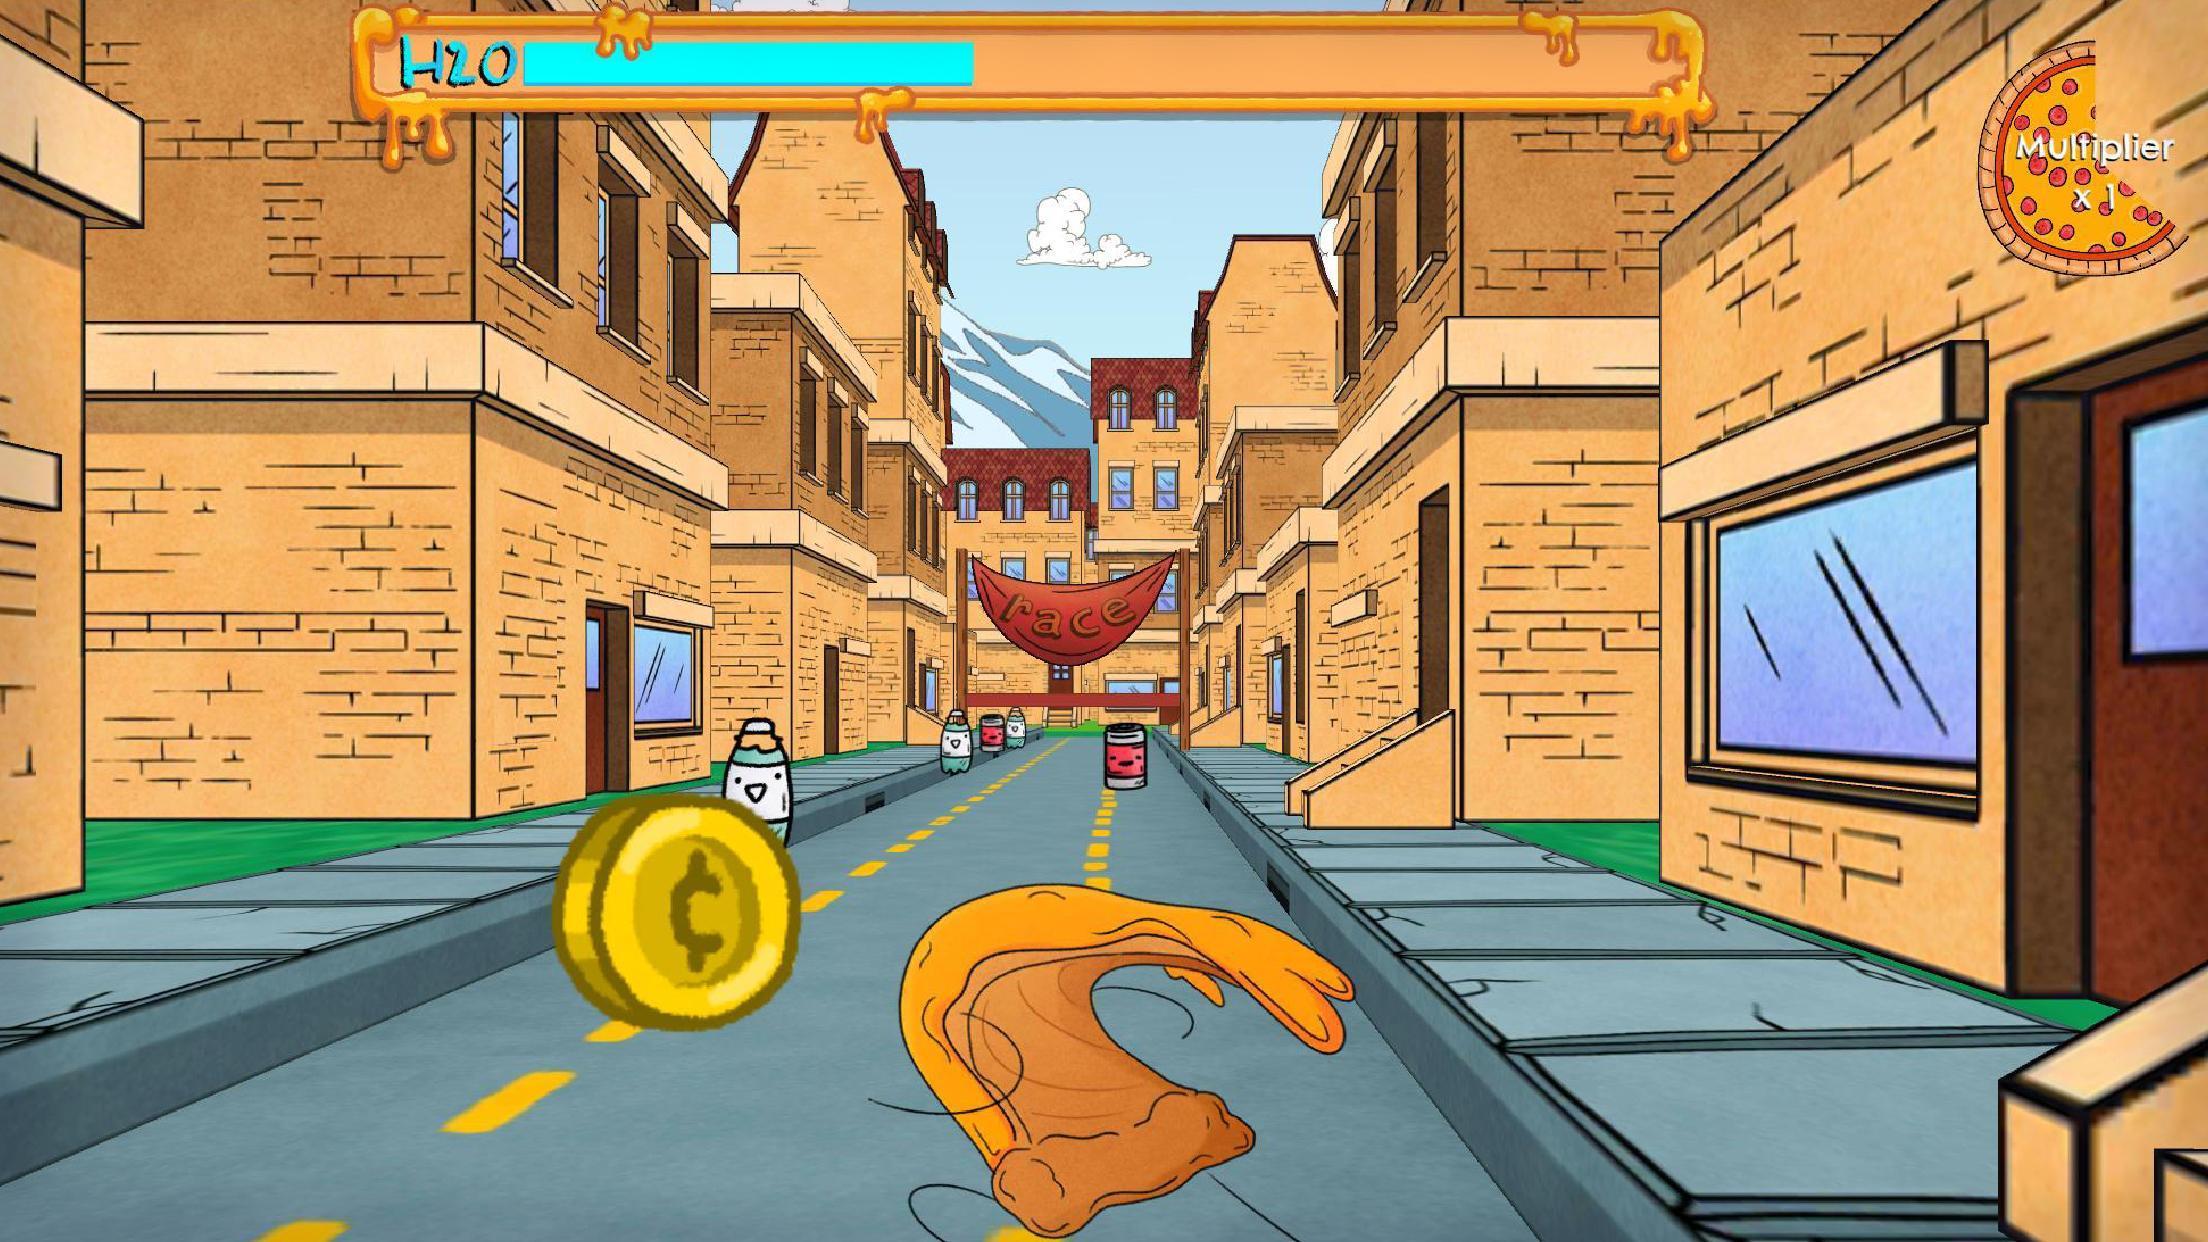 richard download games